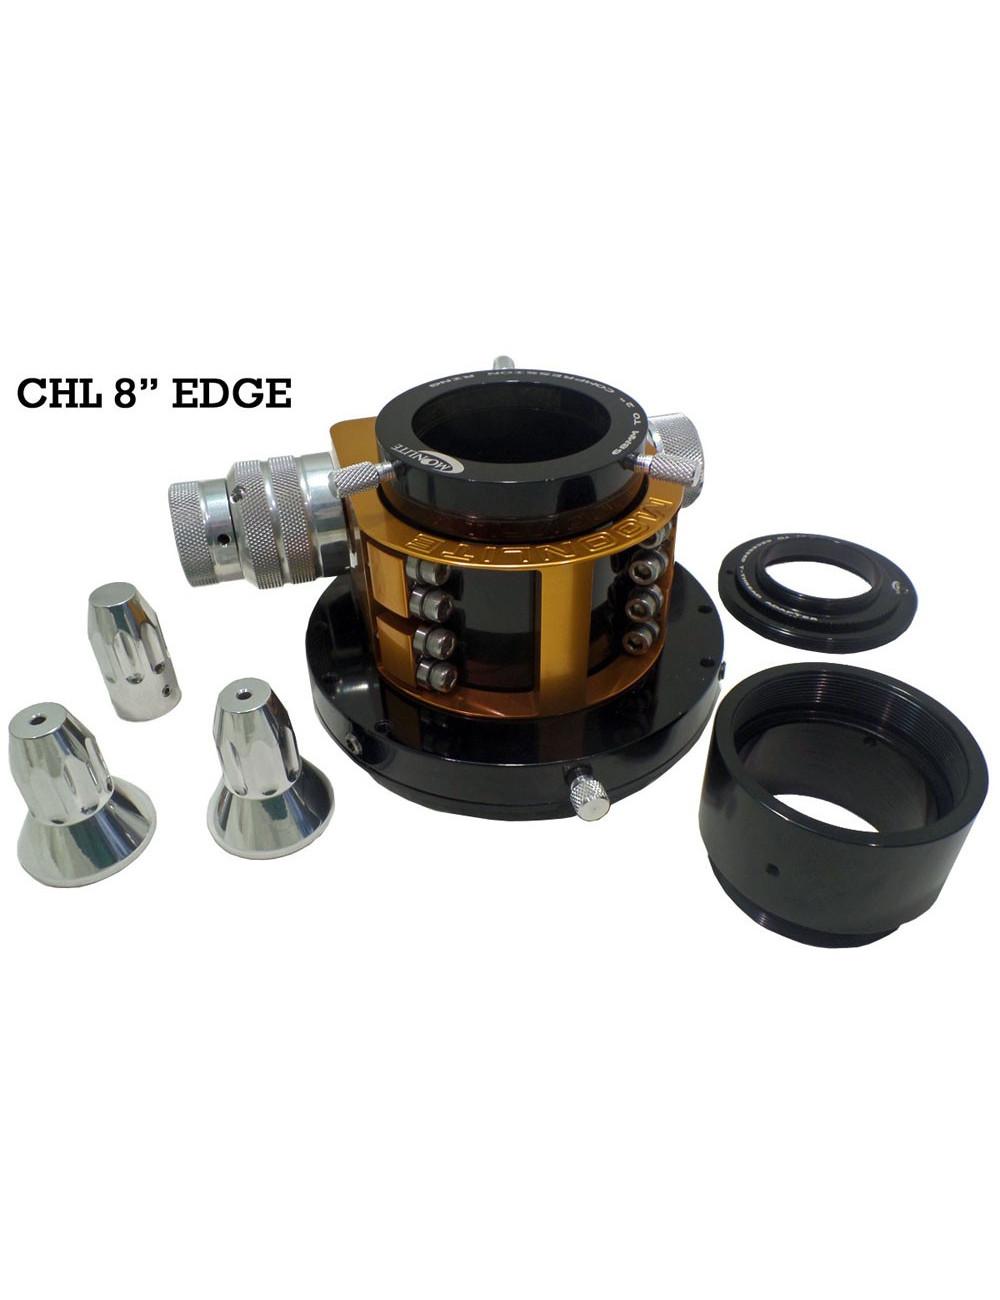 Porte-oculaire Crayford CHL 2,5 pour C8 Edge HD Moonlite